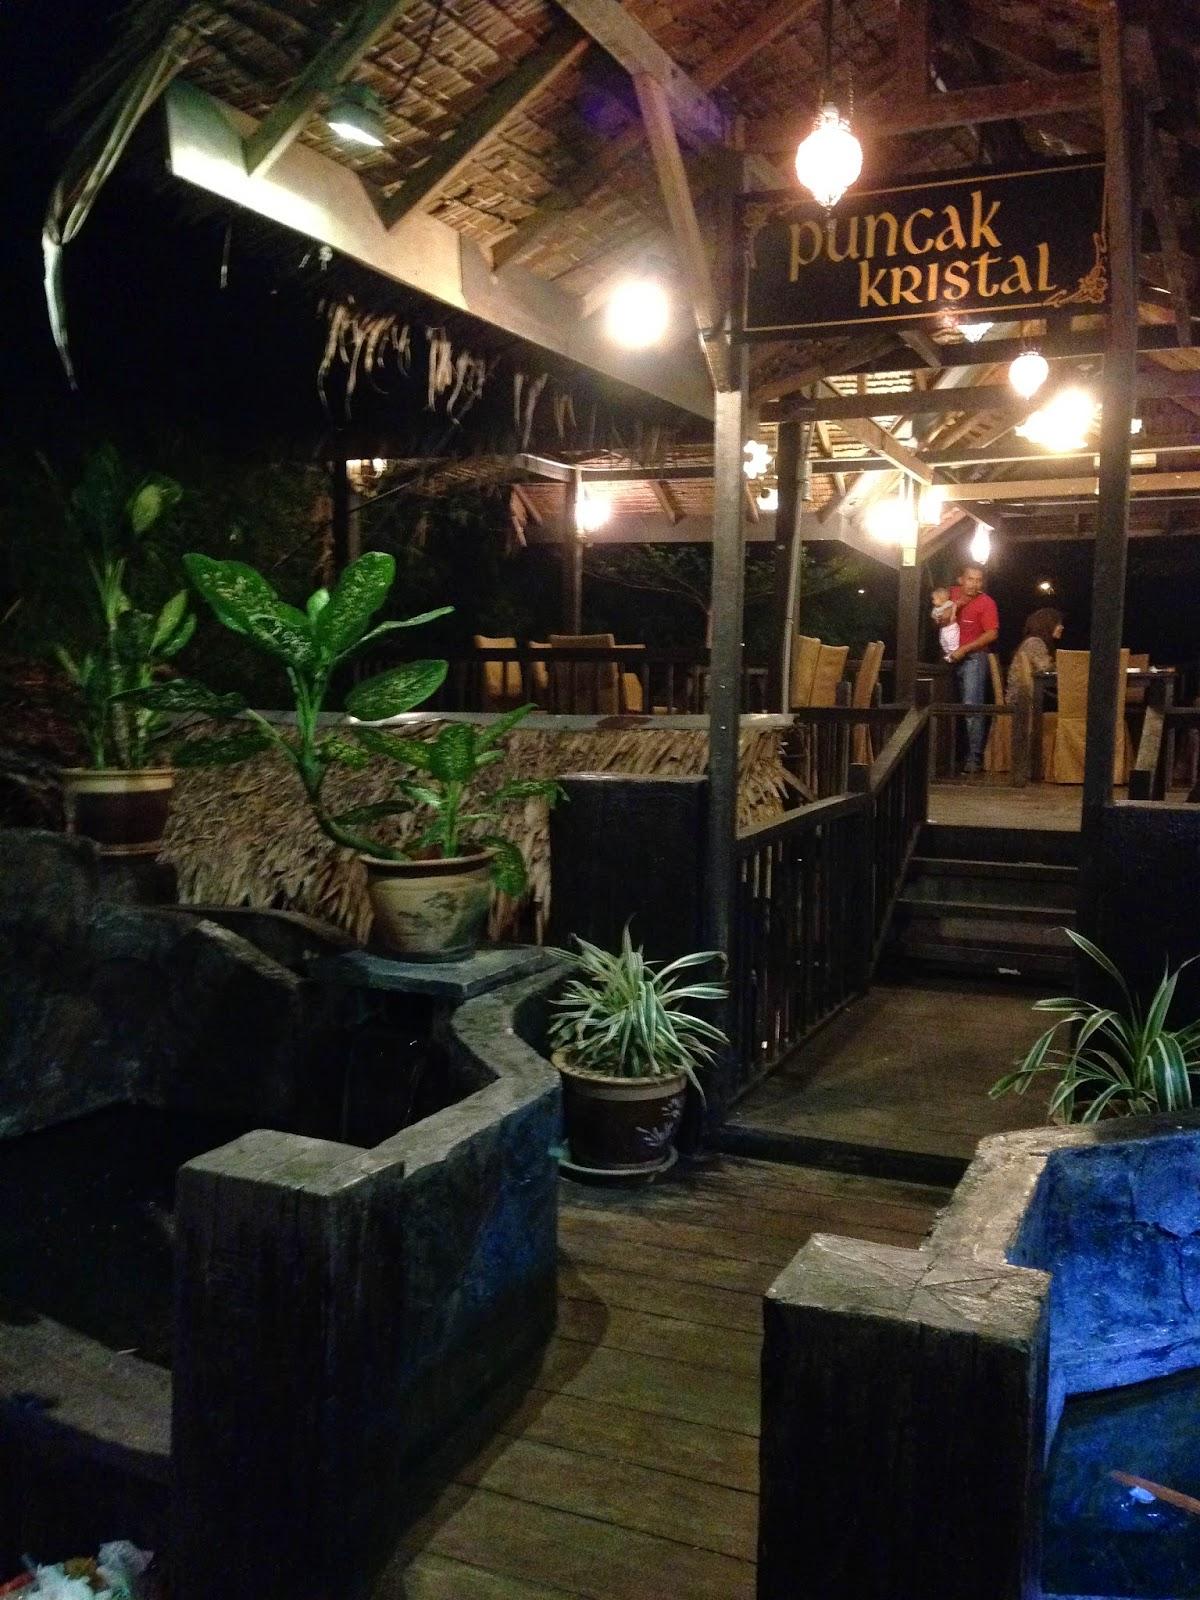 Puncak Mutiara Cafe seating area